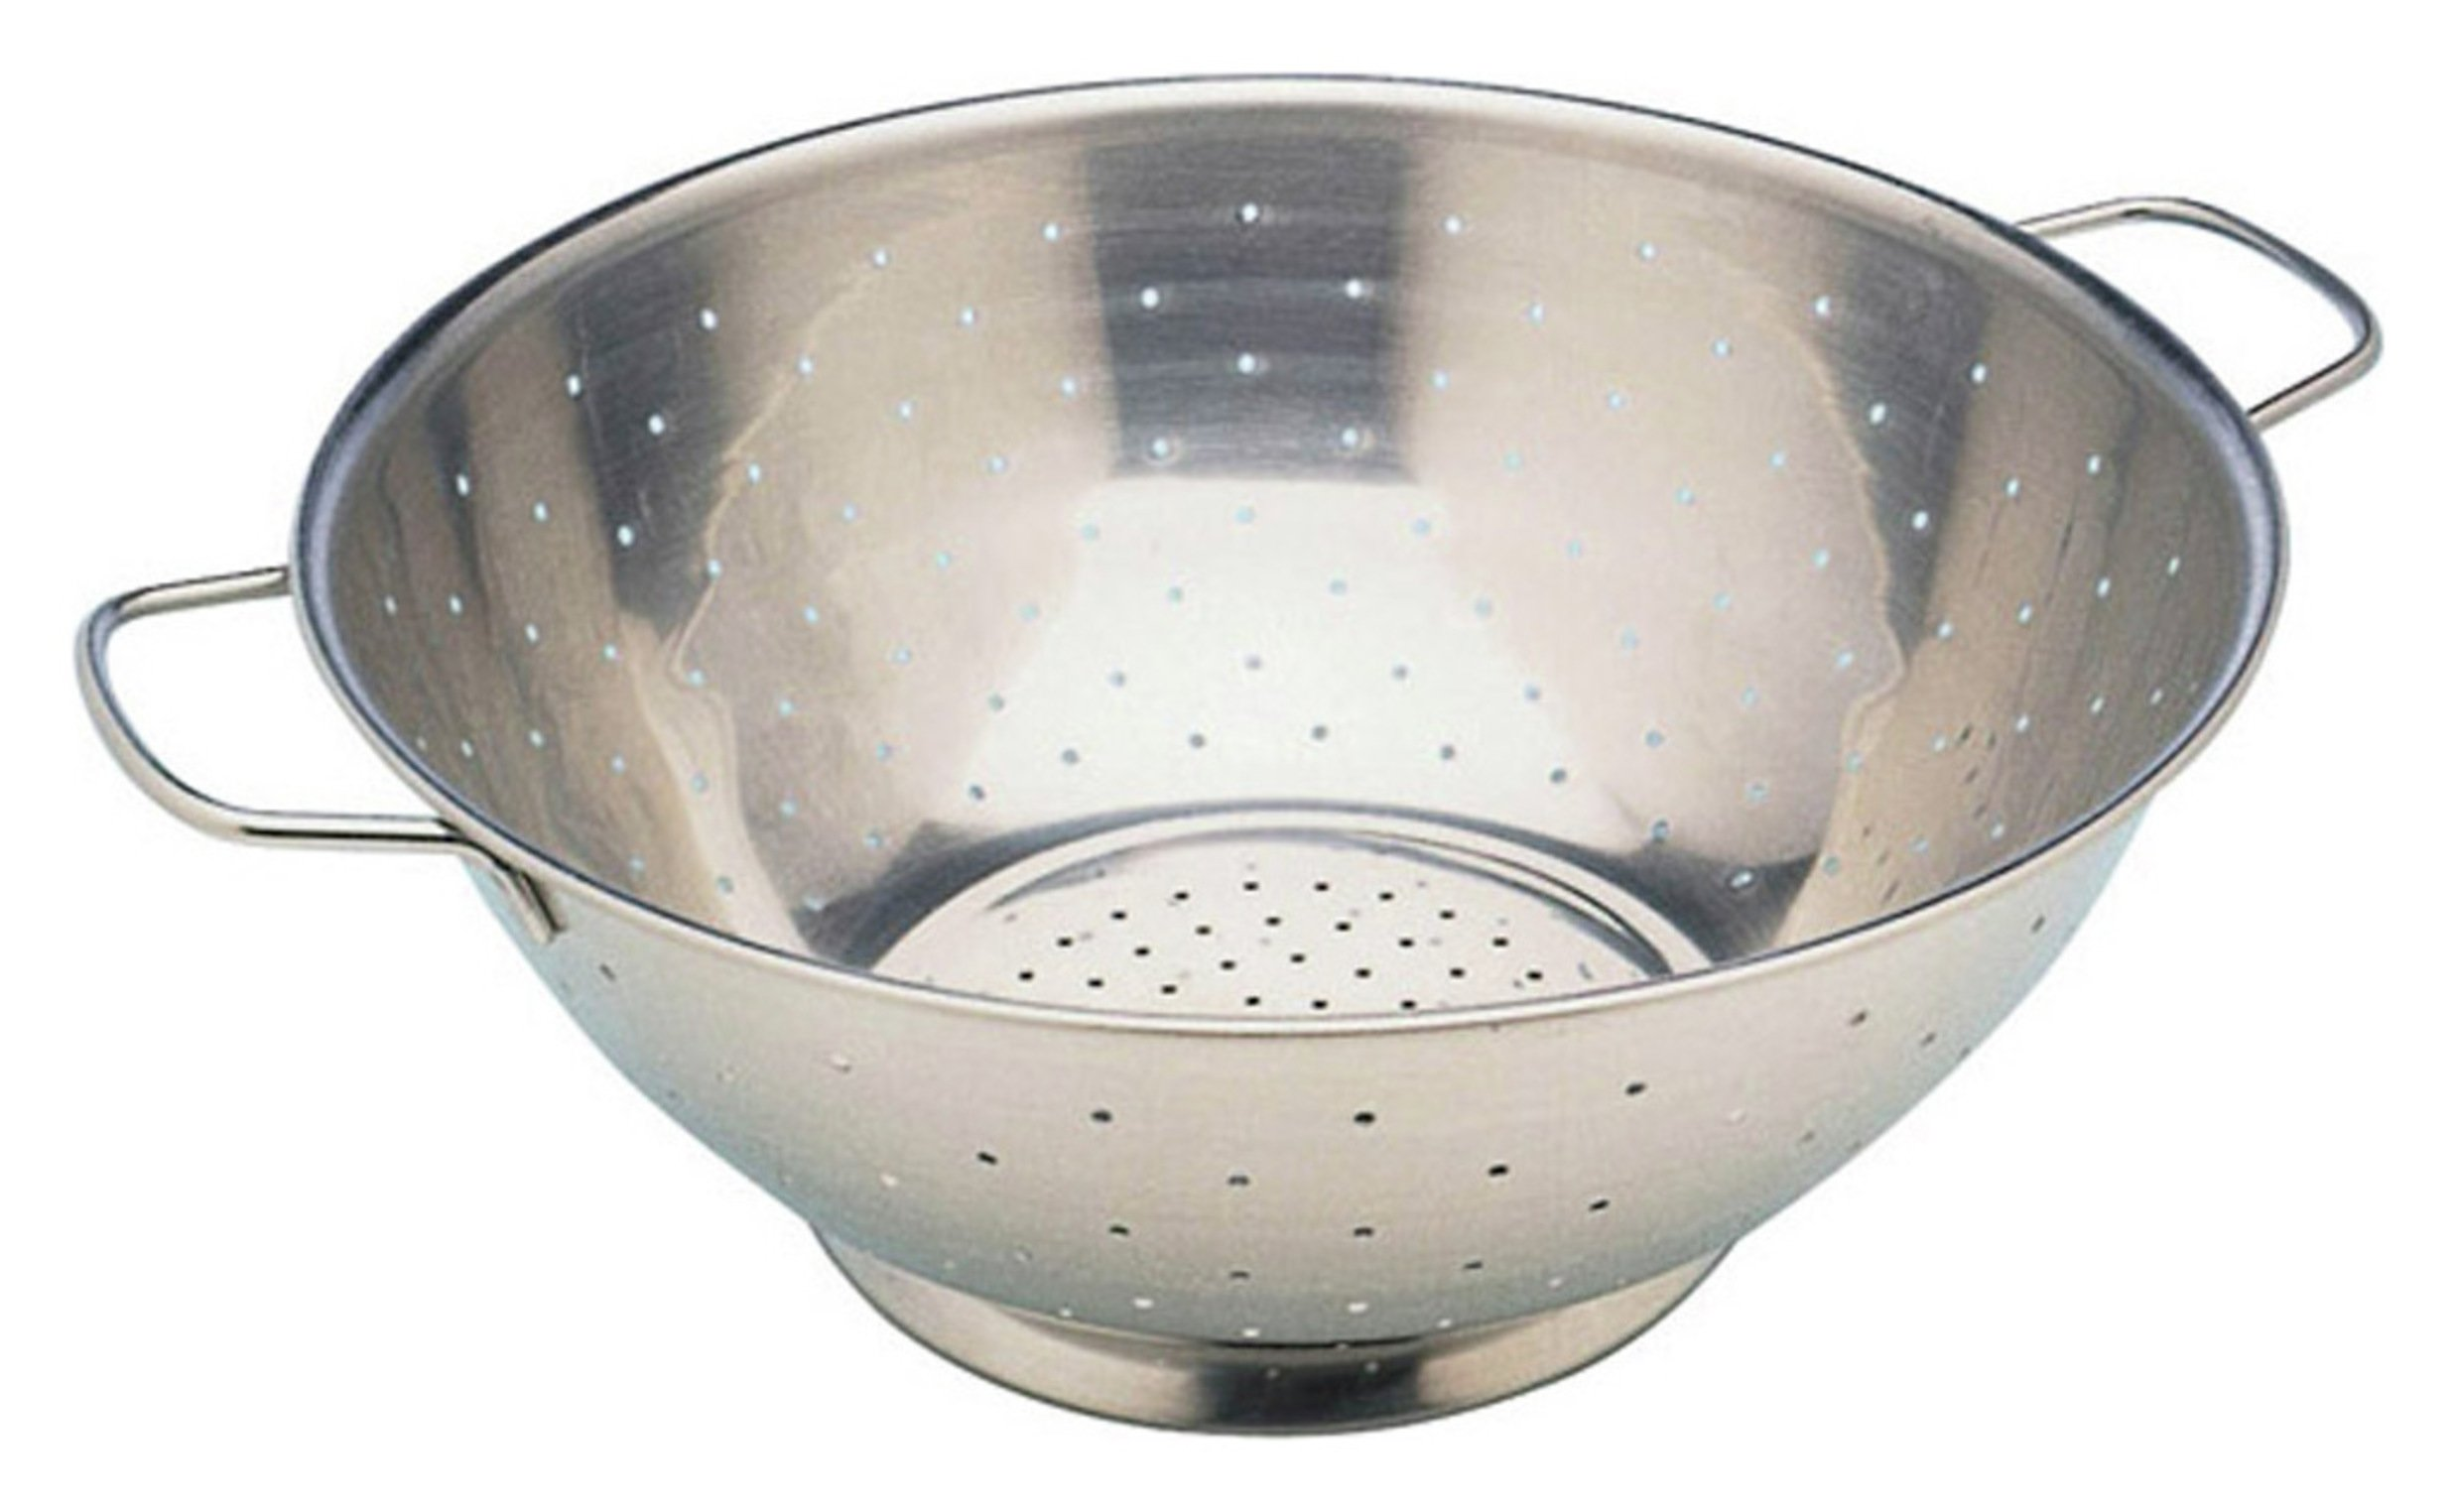 Zodiac 33cm Rice Colander - Stainless Steel